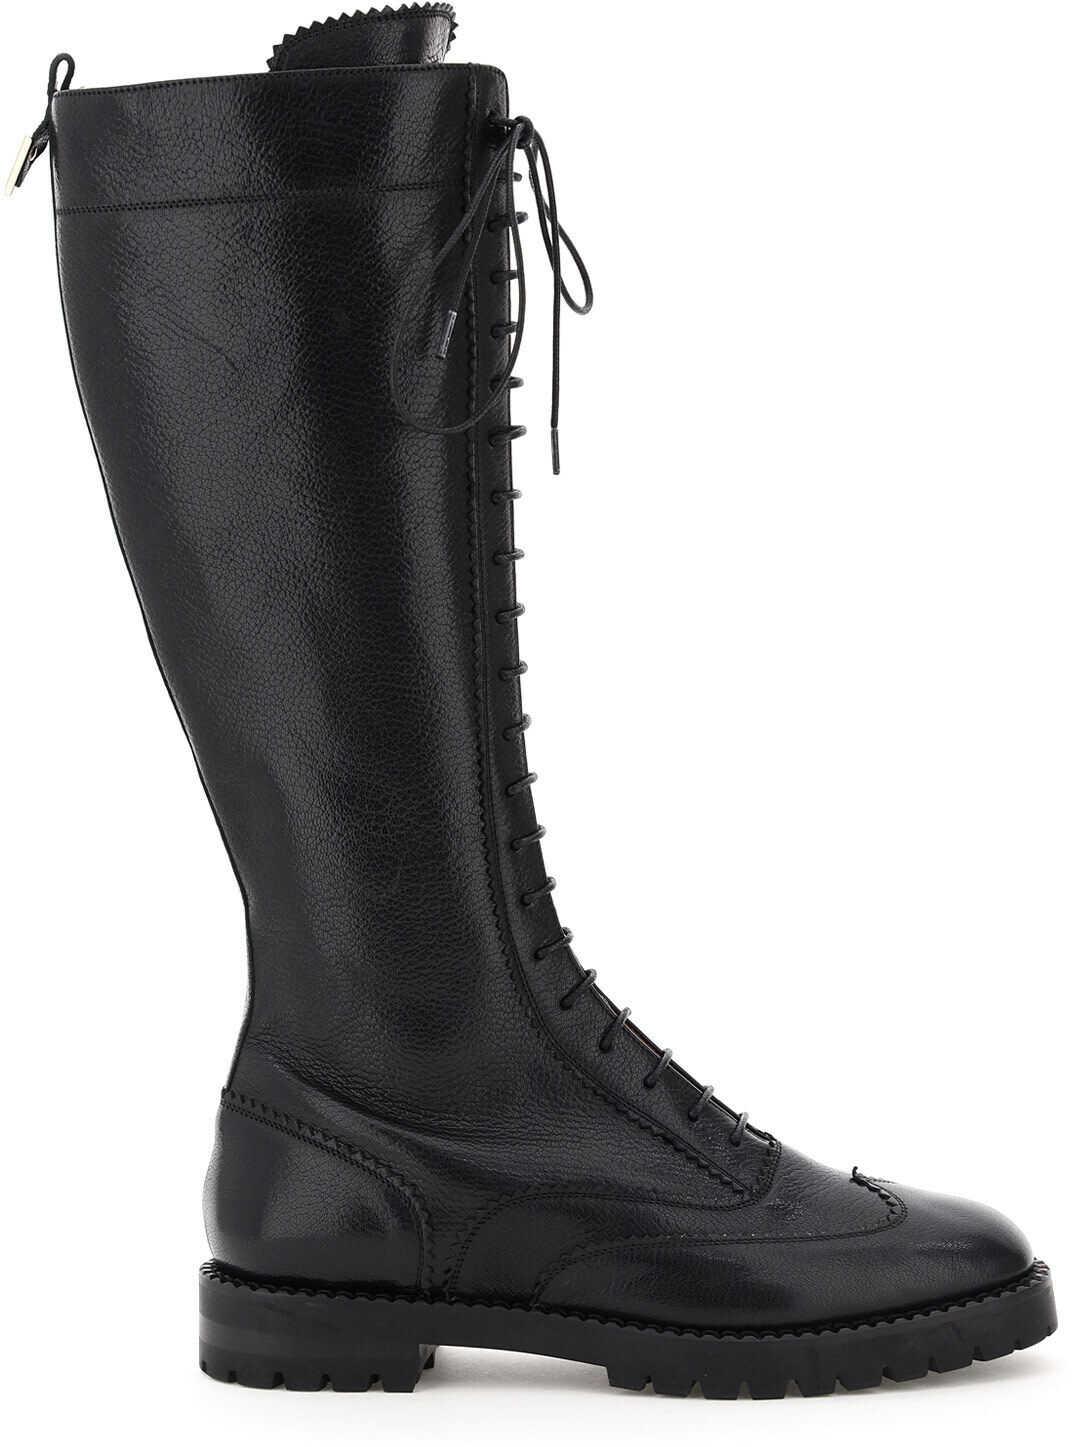 L'Autre Chose Leather Lace-Up Boots LDM020 30GG2466 BLACK imagine b-mall.ro